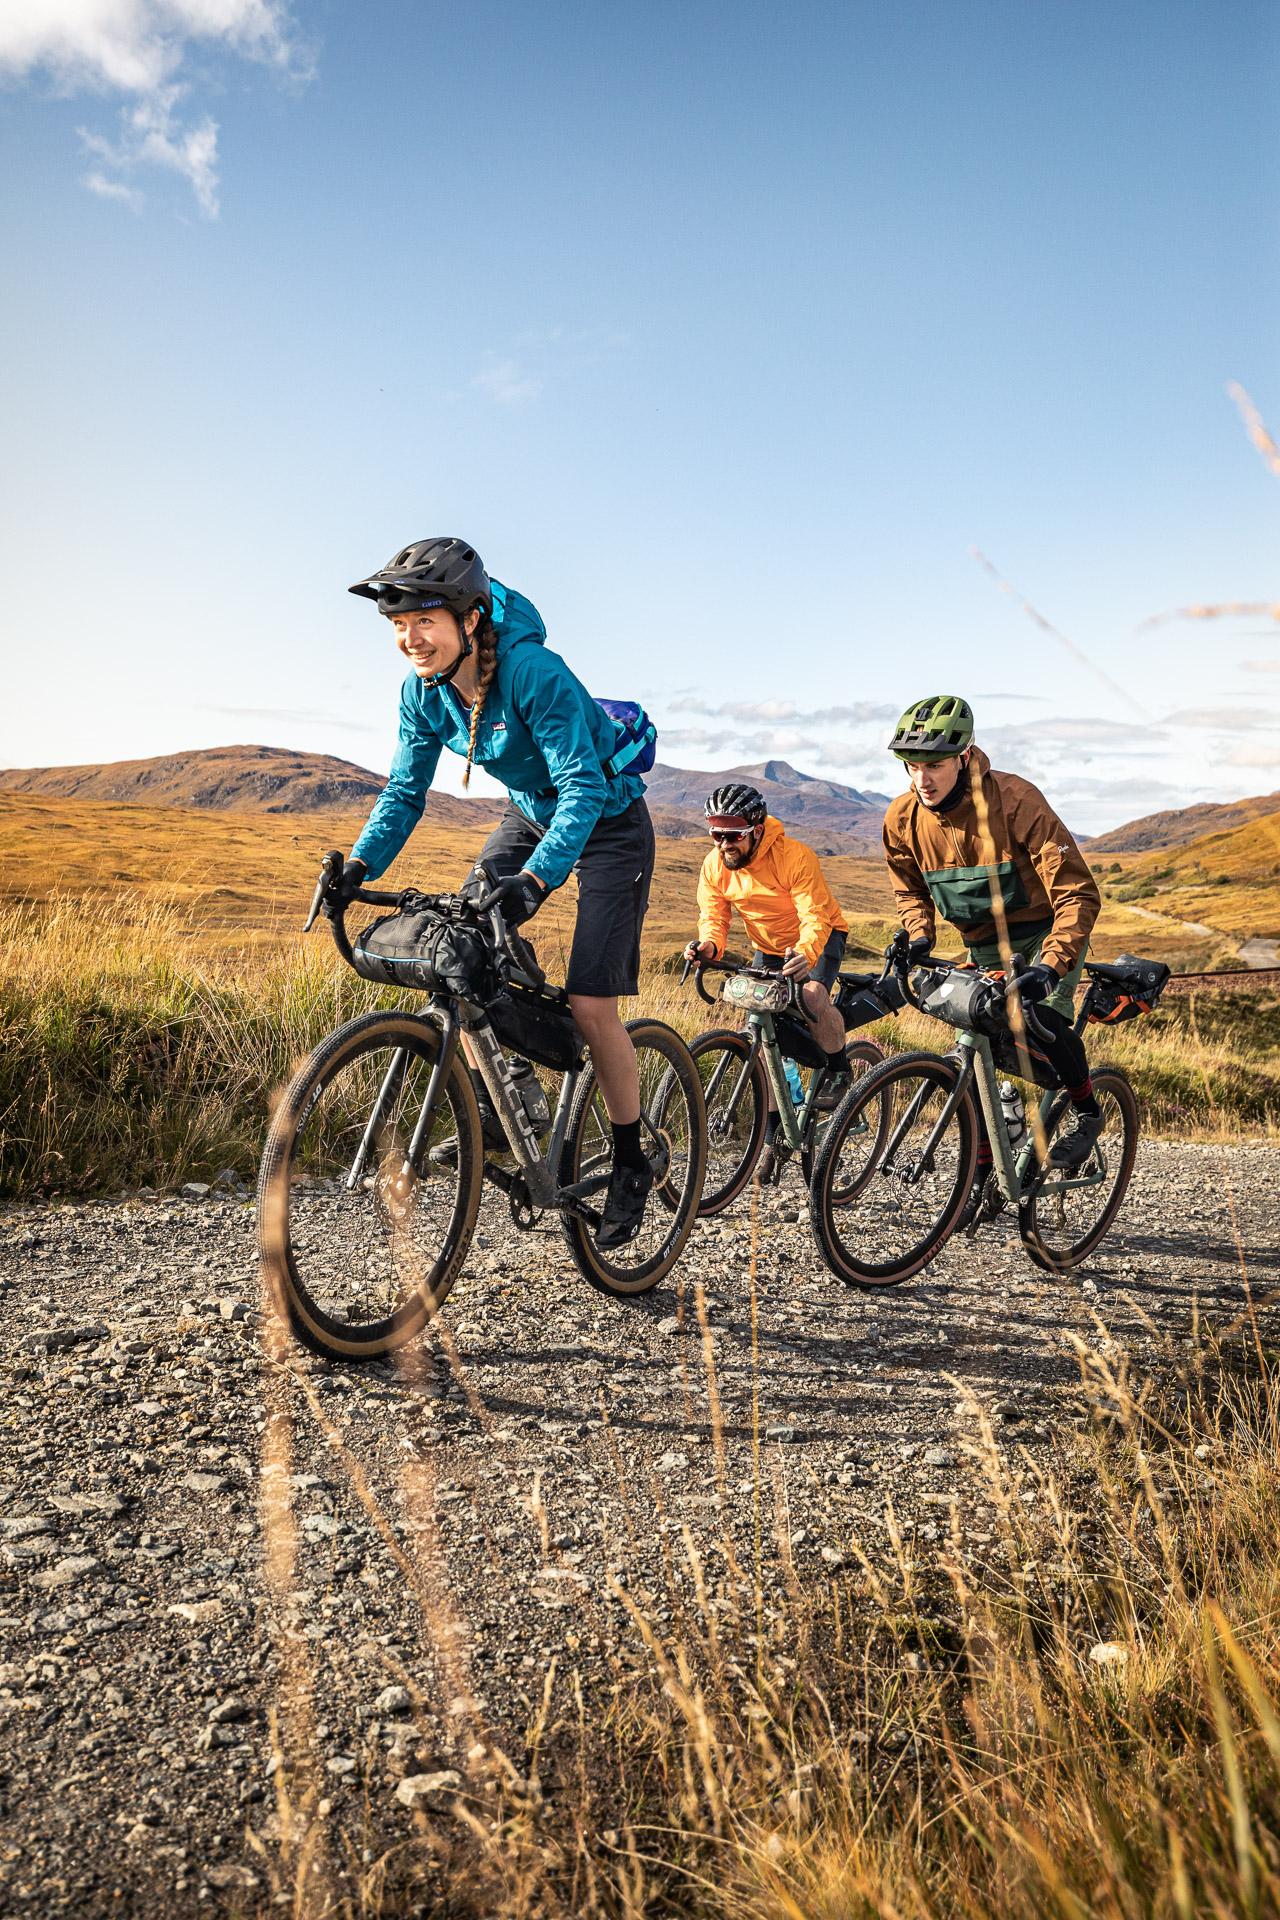 FOCUS-Bikes-ATLAS-Schottland-2020-_W5A0629